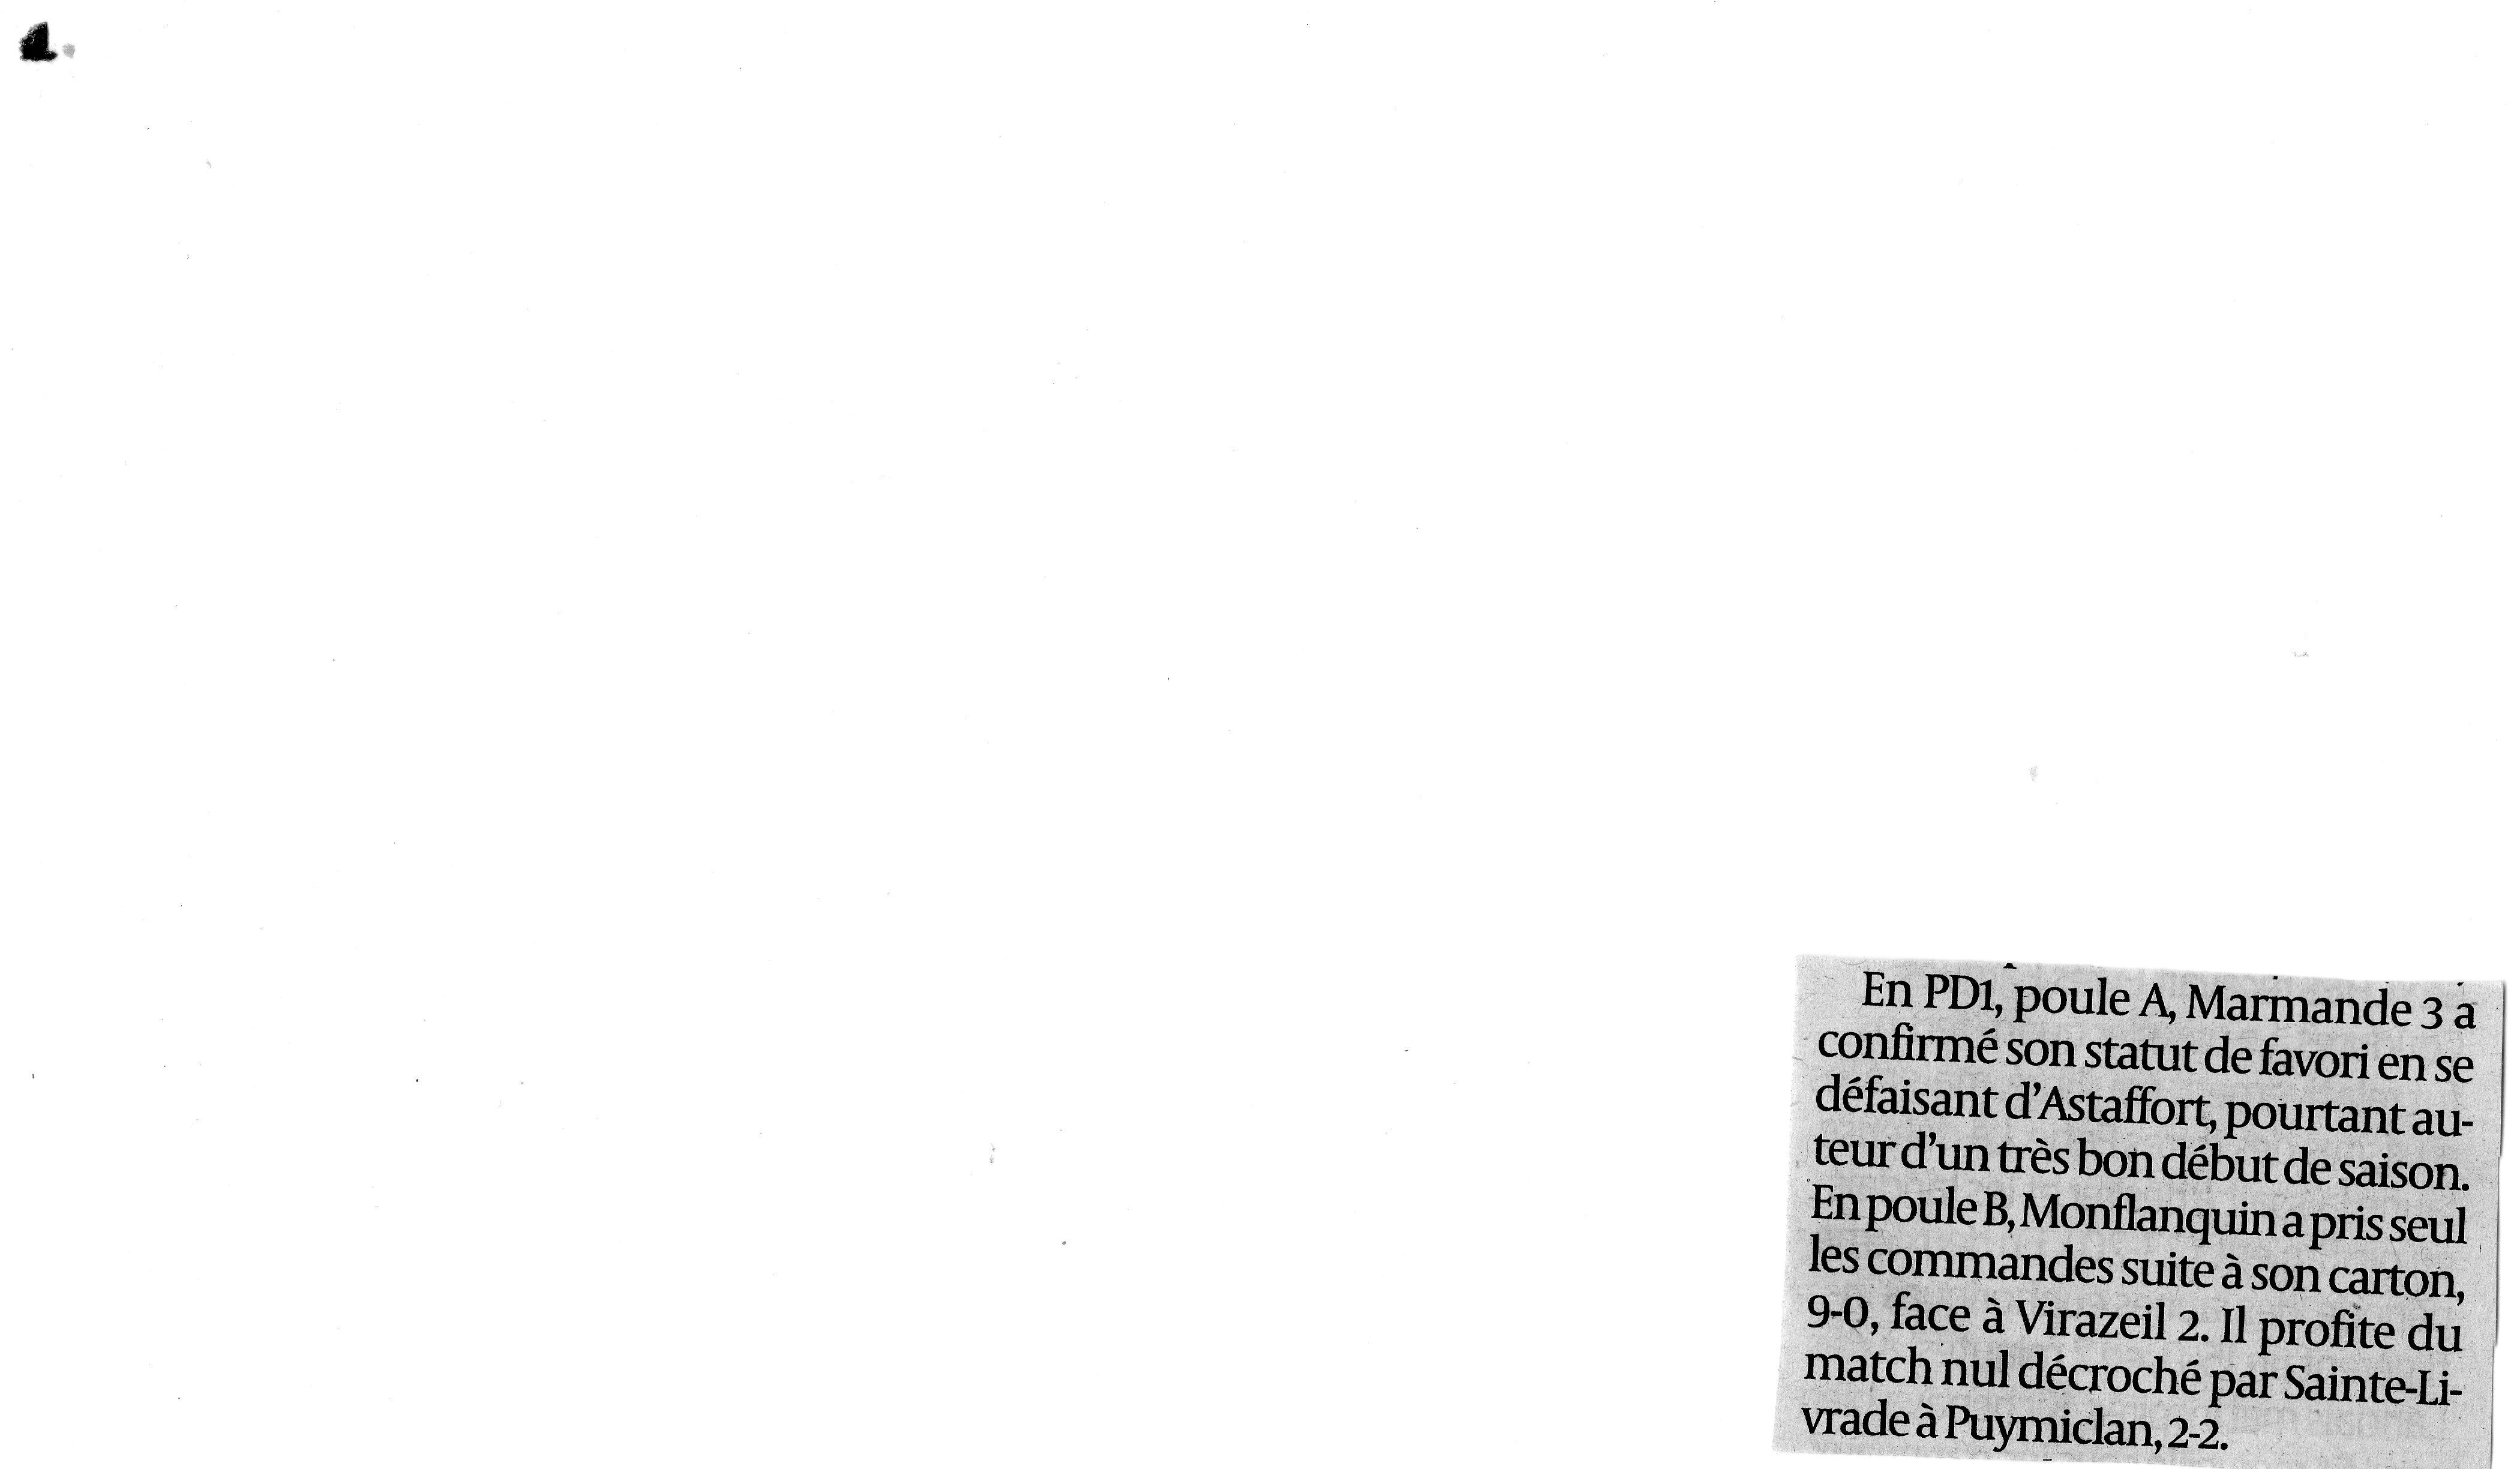 http://staff.footeo.com/uploads/asccl/Medias/article_sud_ouest__22_09_2013...tonneins.jpg